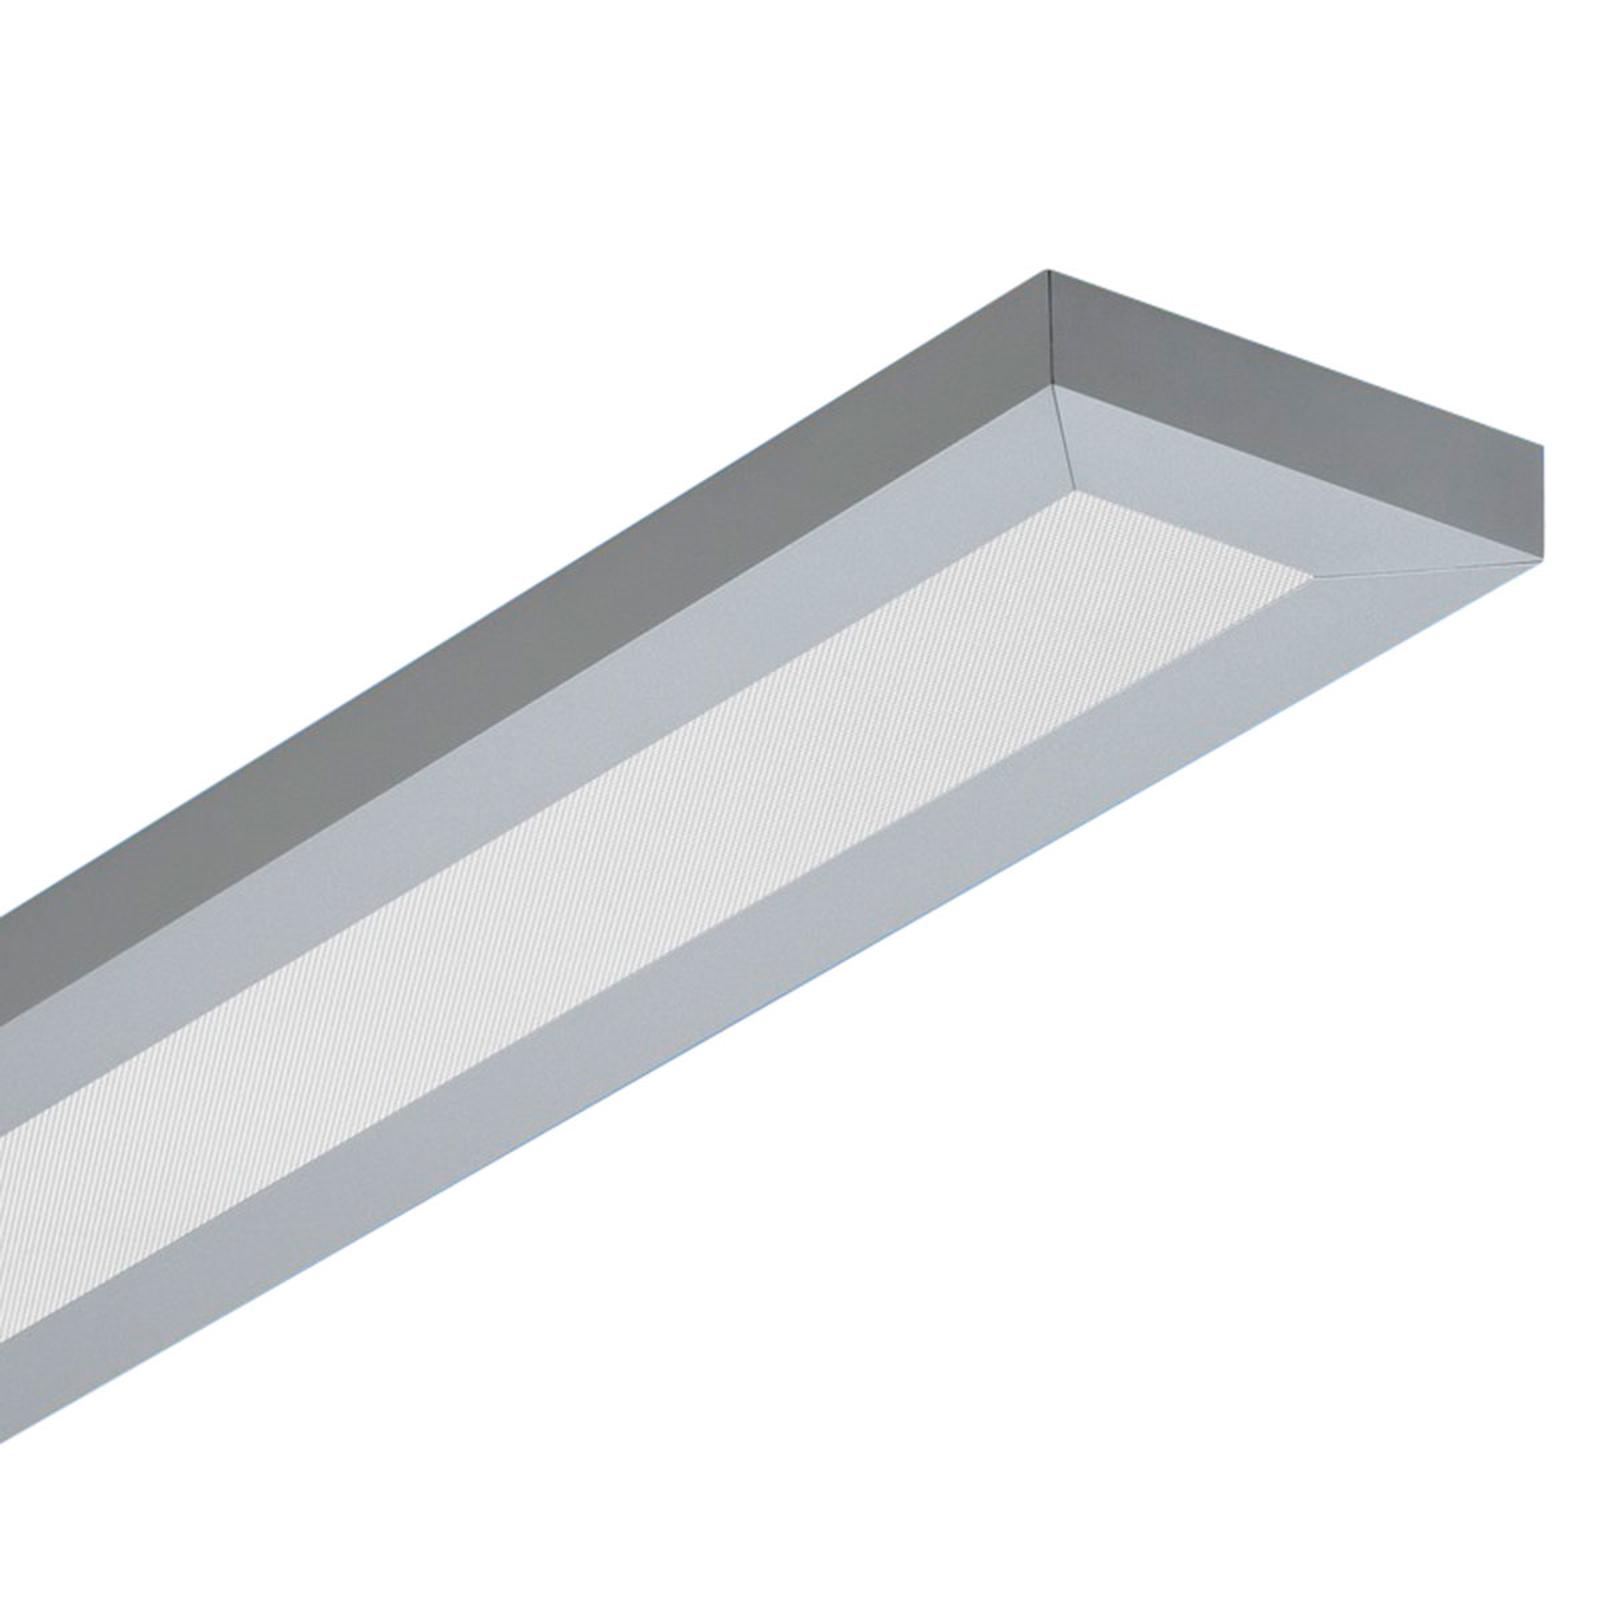 Pitkä LED-riippuvalaisin LAP, 30,4 W; 4 000 K